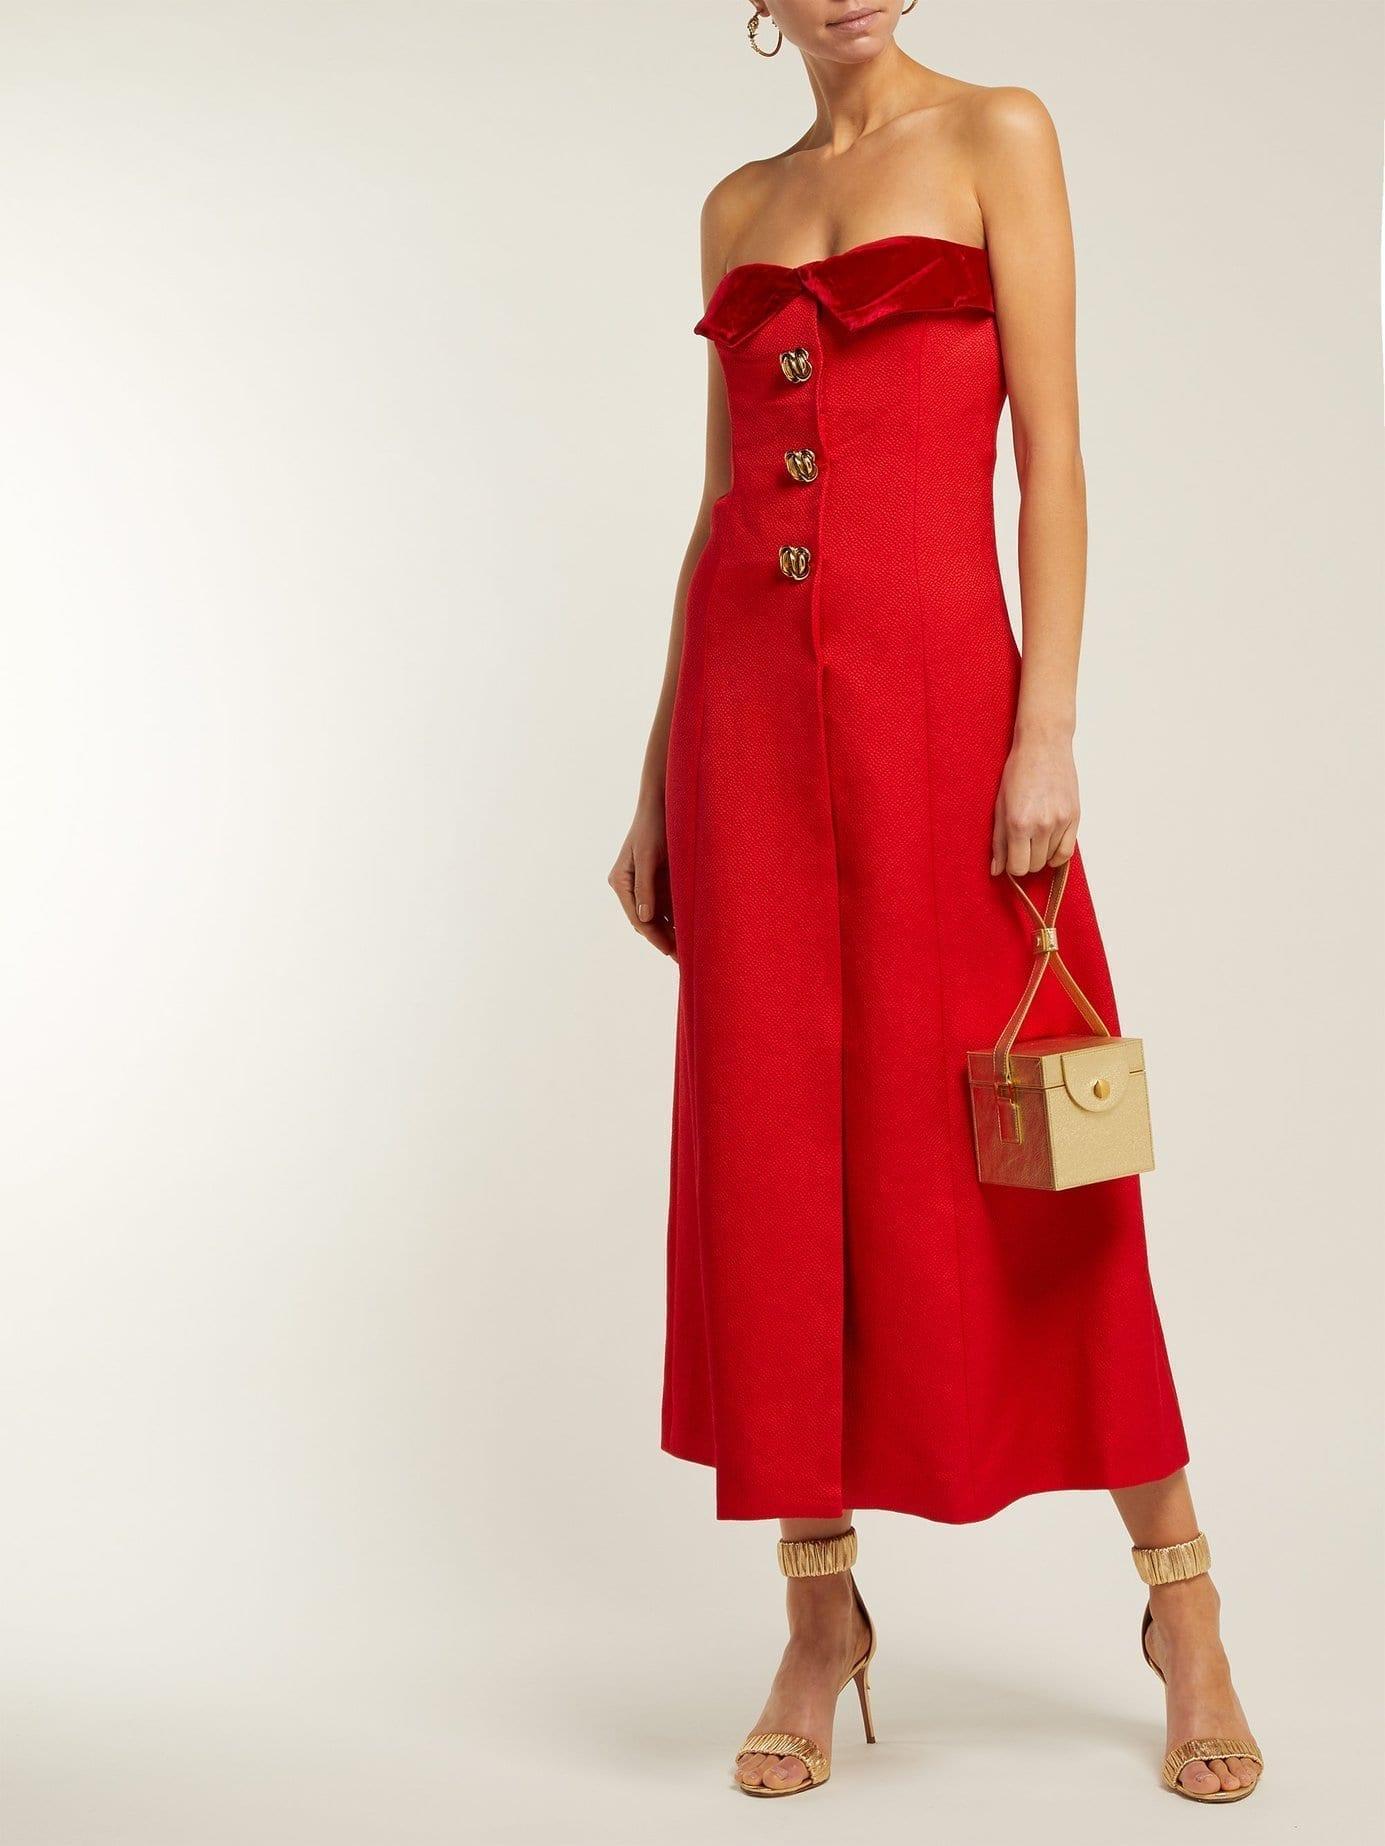 REBECCA DE RAVENEL Strapless Silk And Wool-blend Midi Red Dress